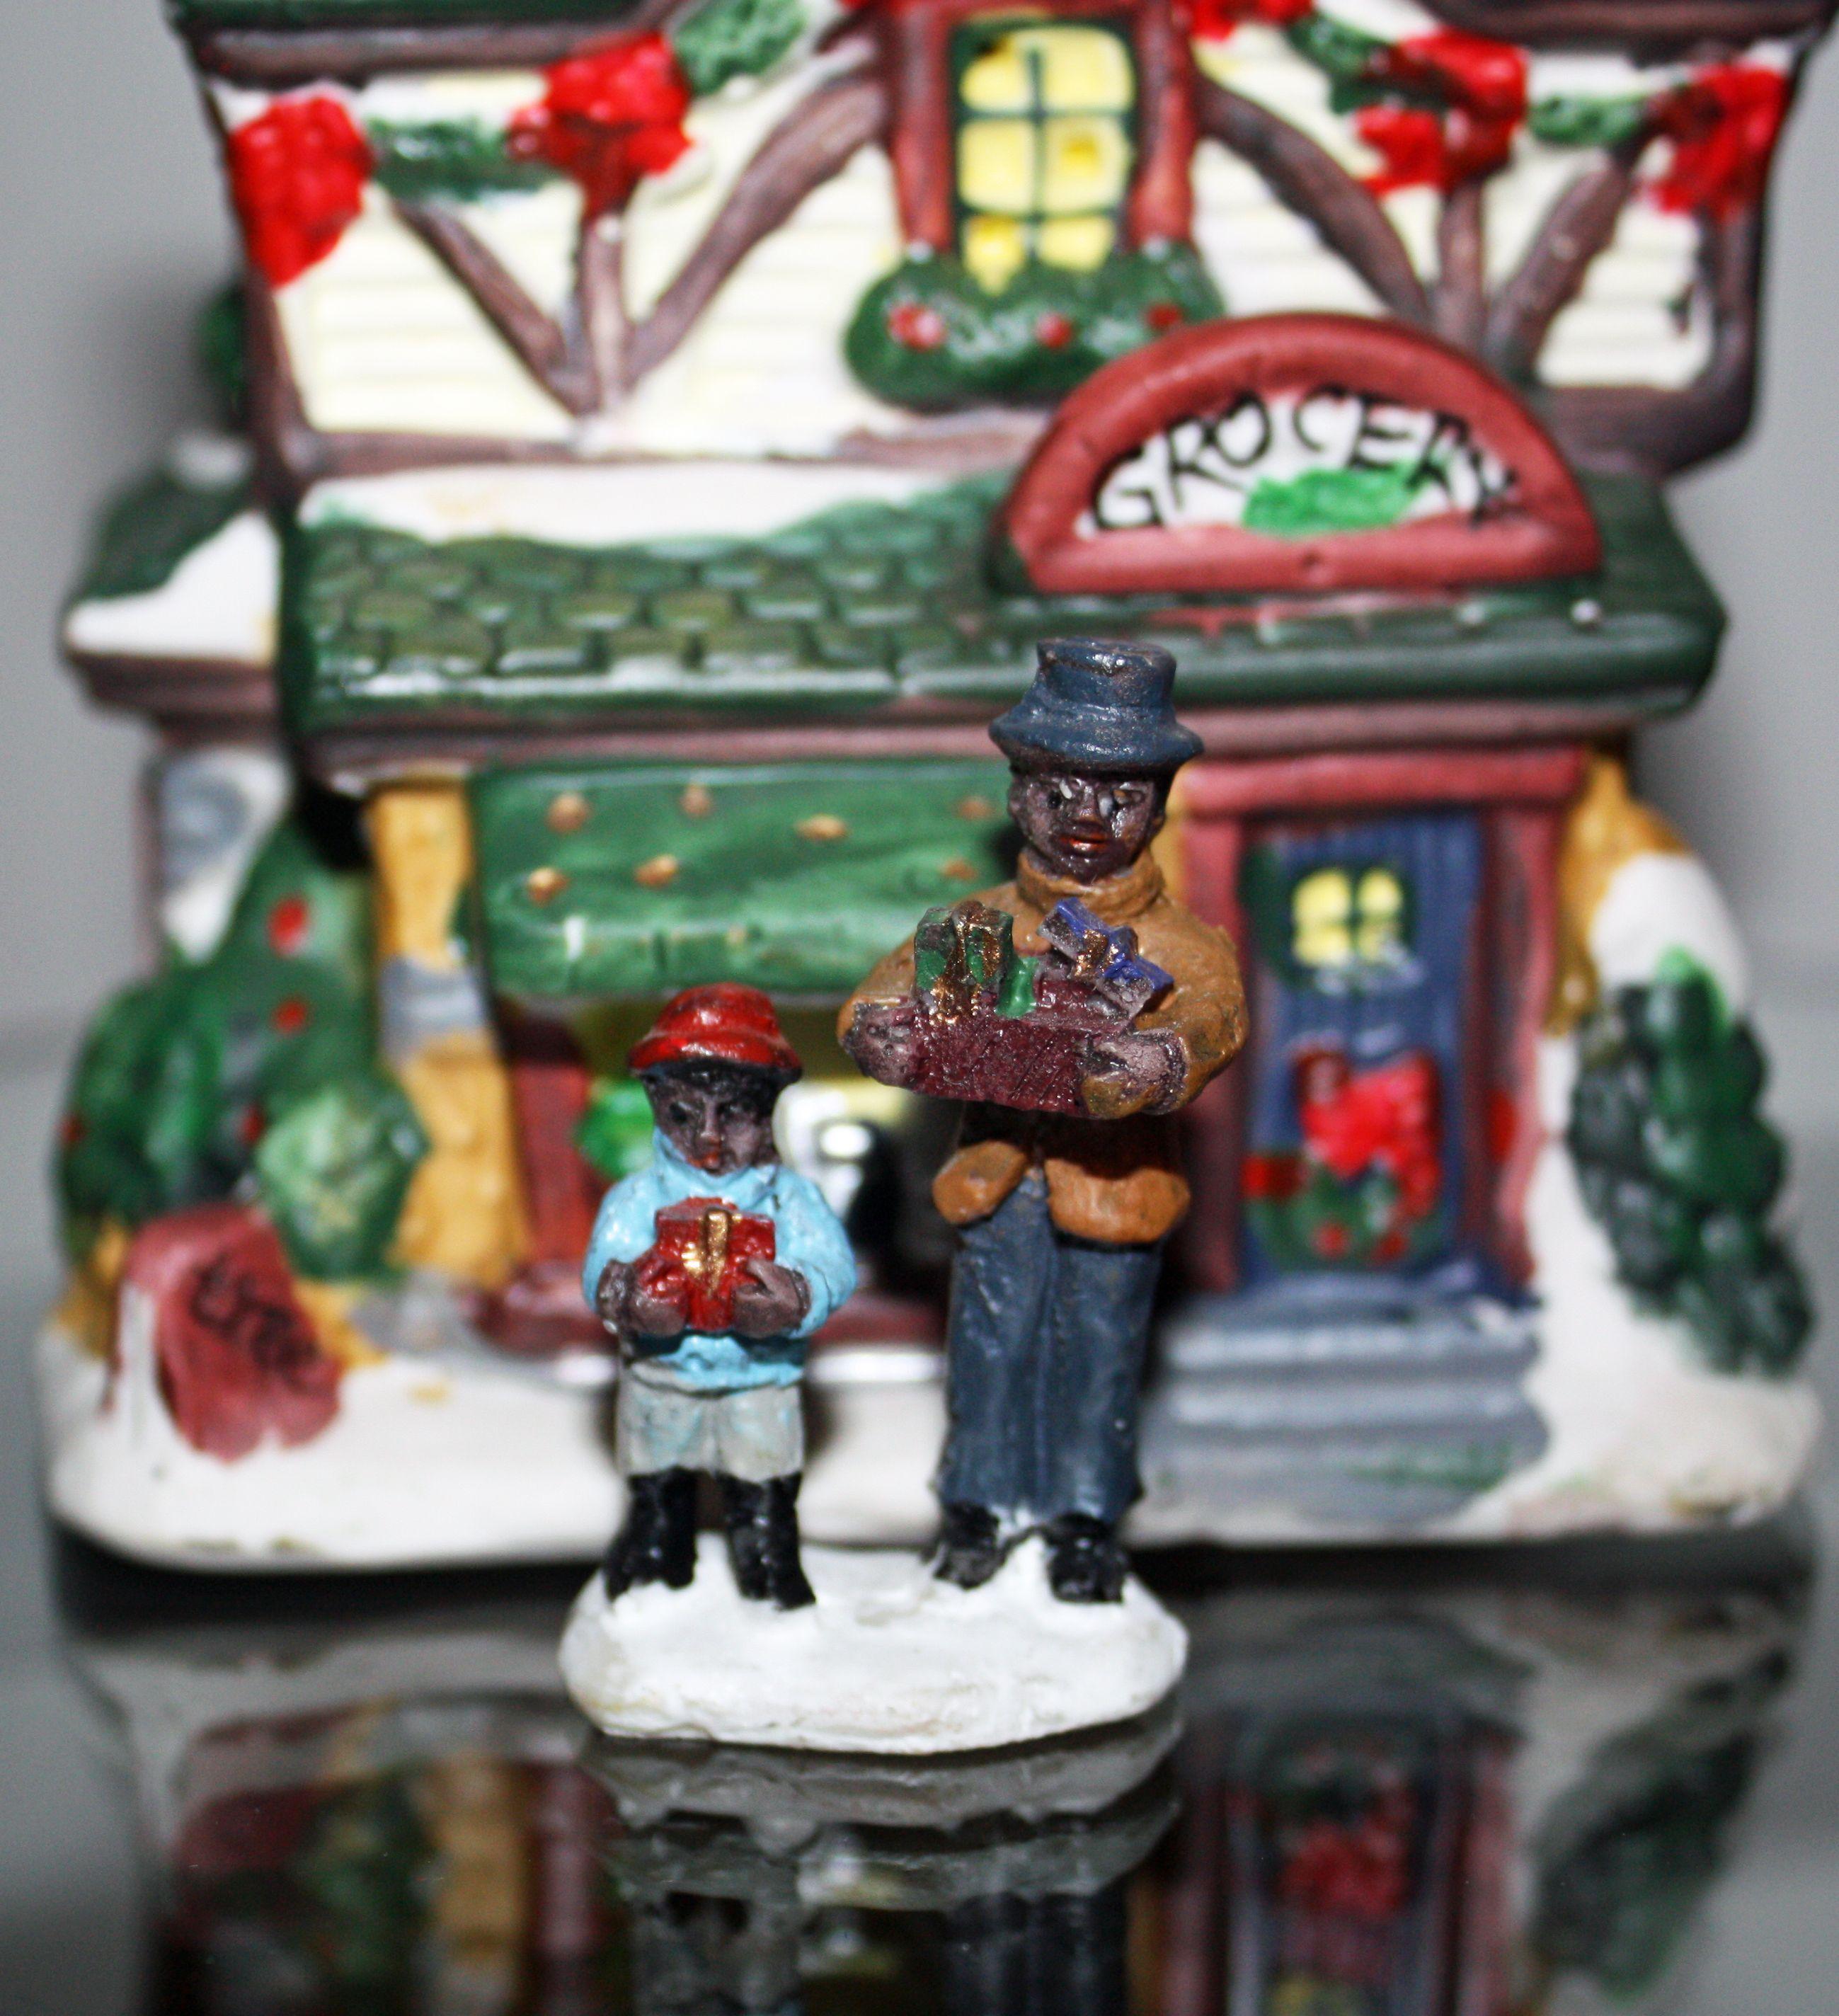 Mini Christmas Village Display.Black African American Family Christmas Shopping Mini